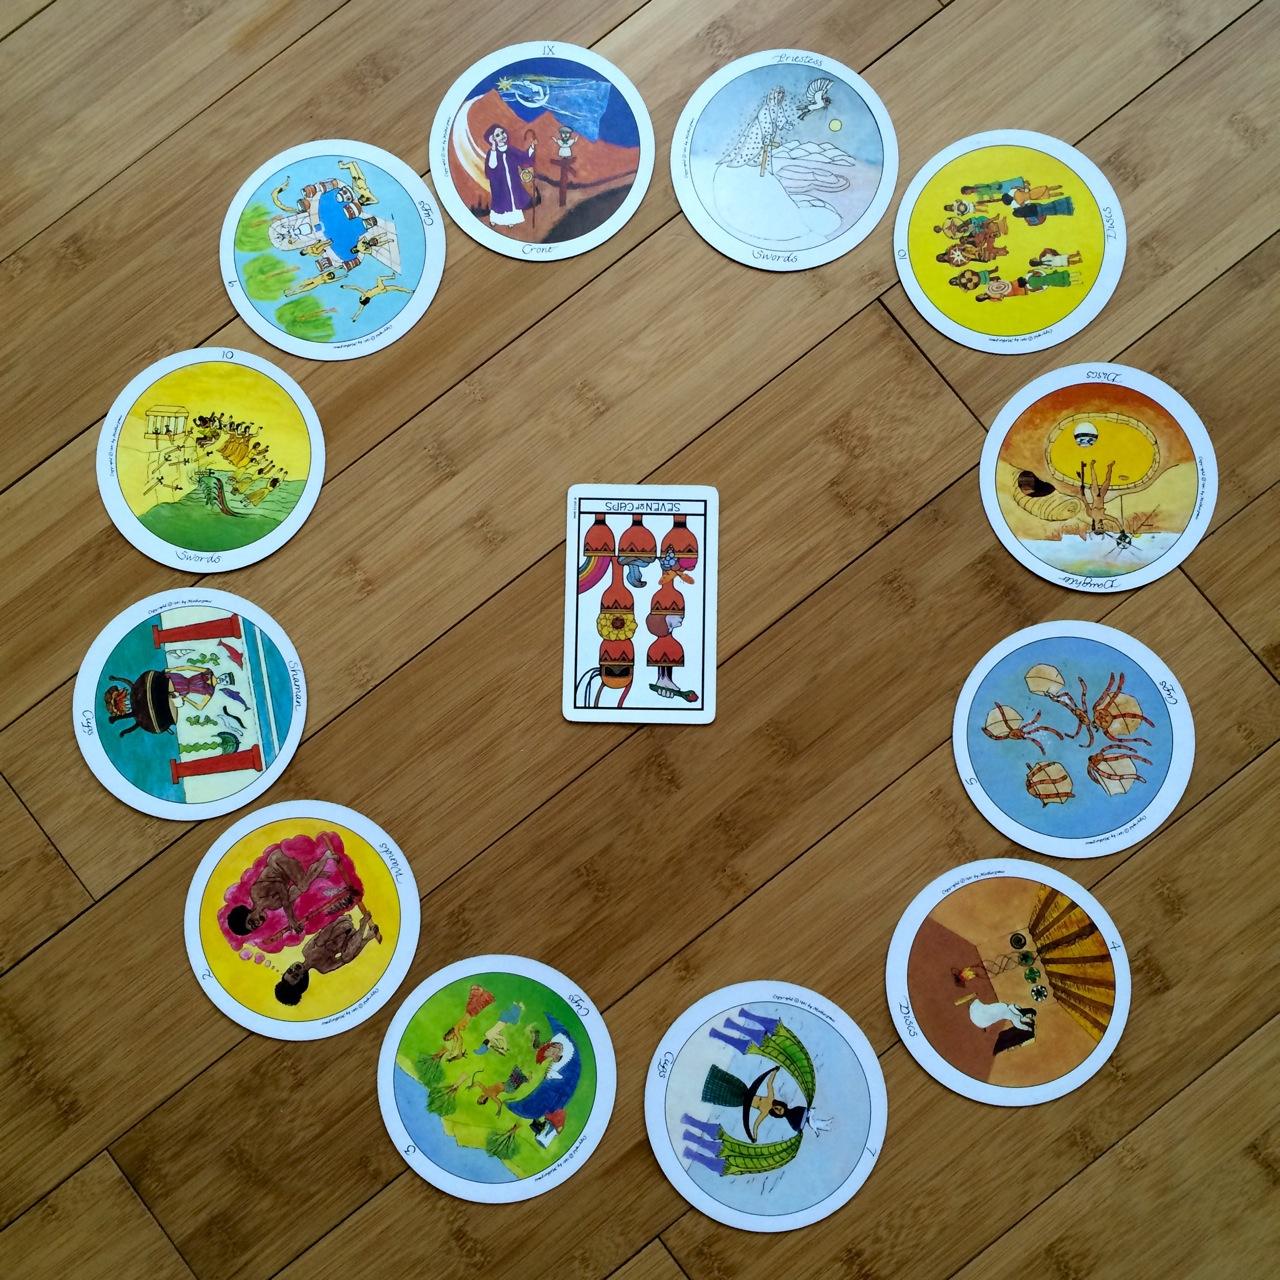 Zodiac spread, Motherpeace and Aquarian tarot decks